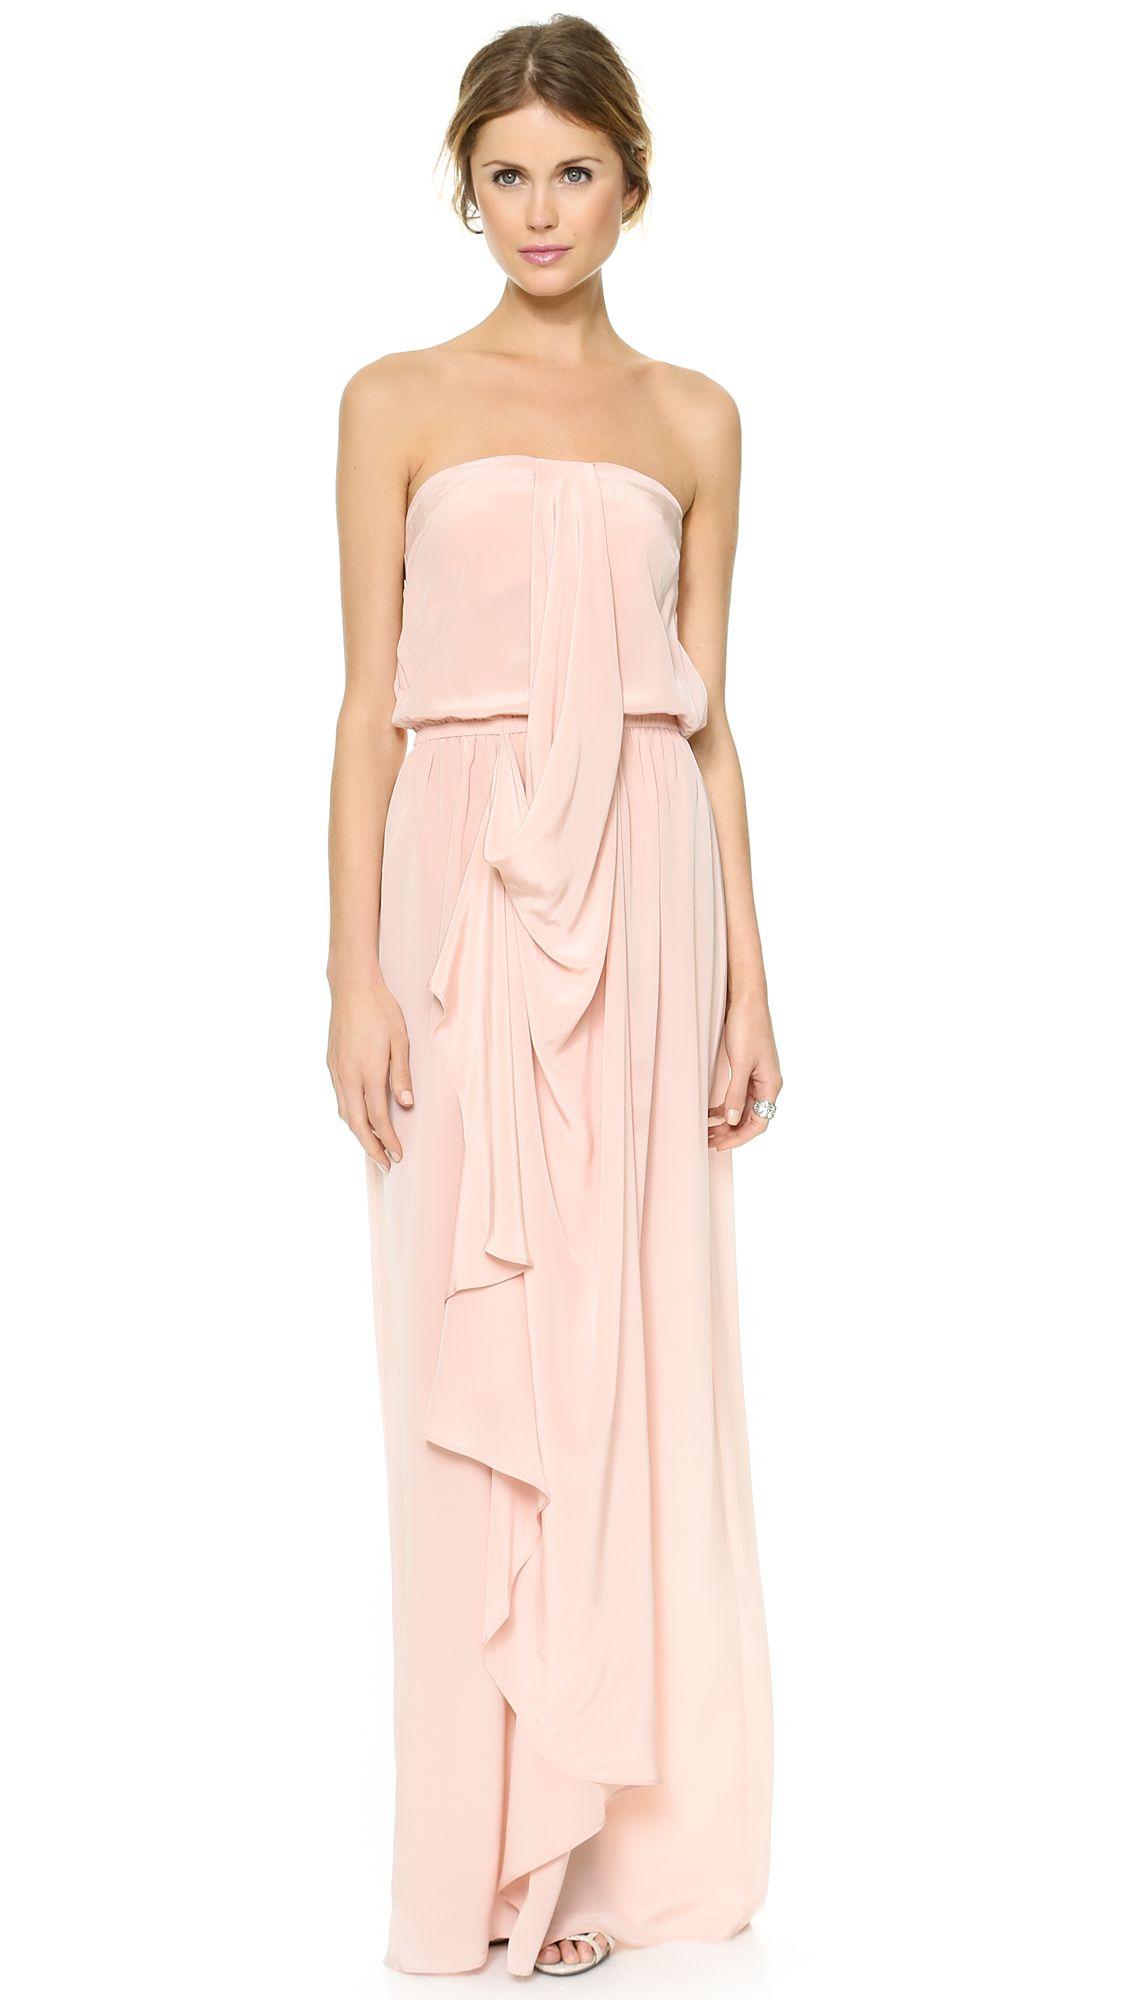 Strapless Draped Maxi Dress